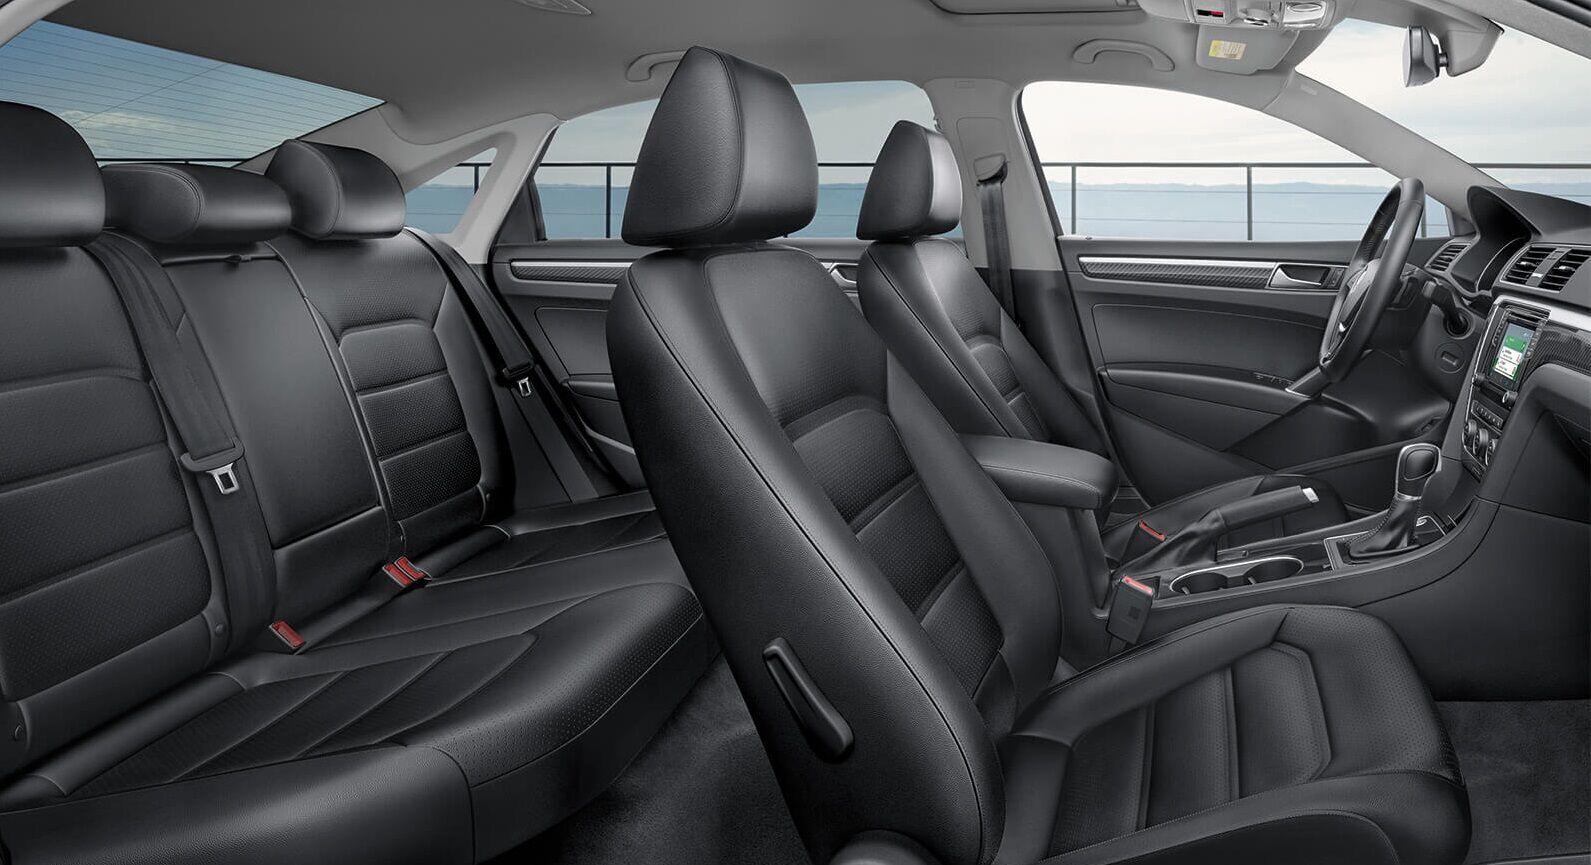 A Red 2019 VW Passat Interiors